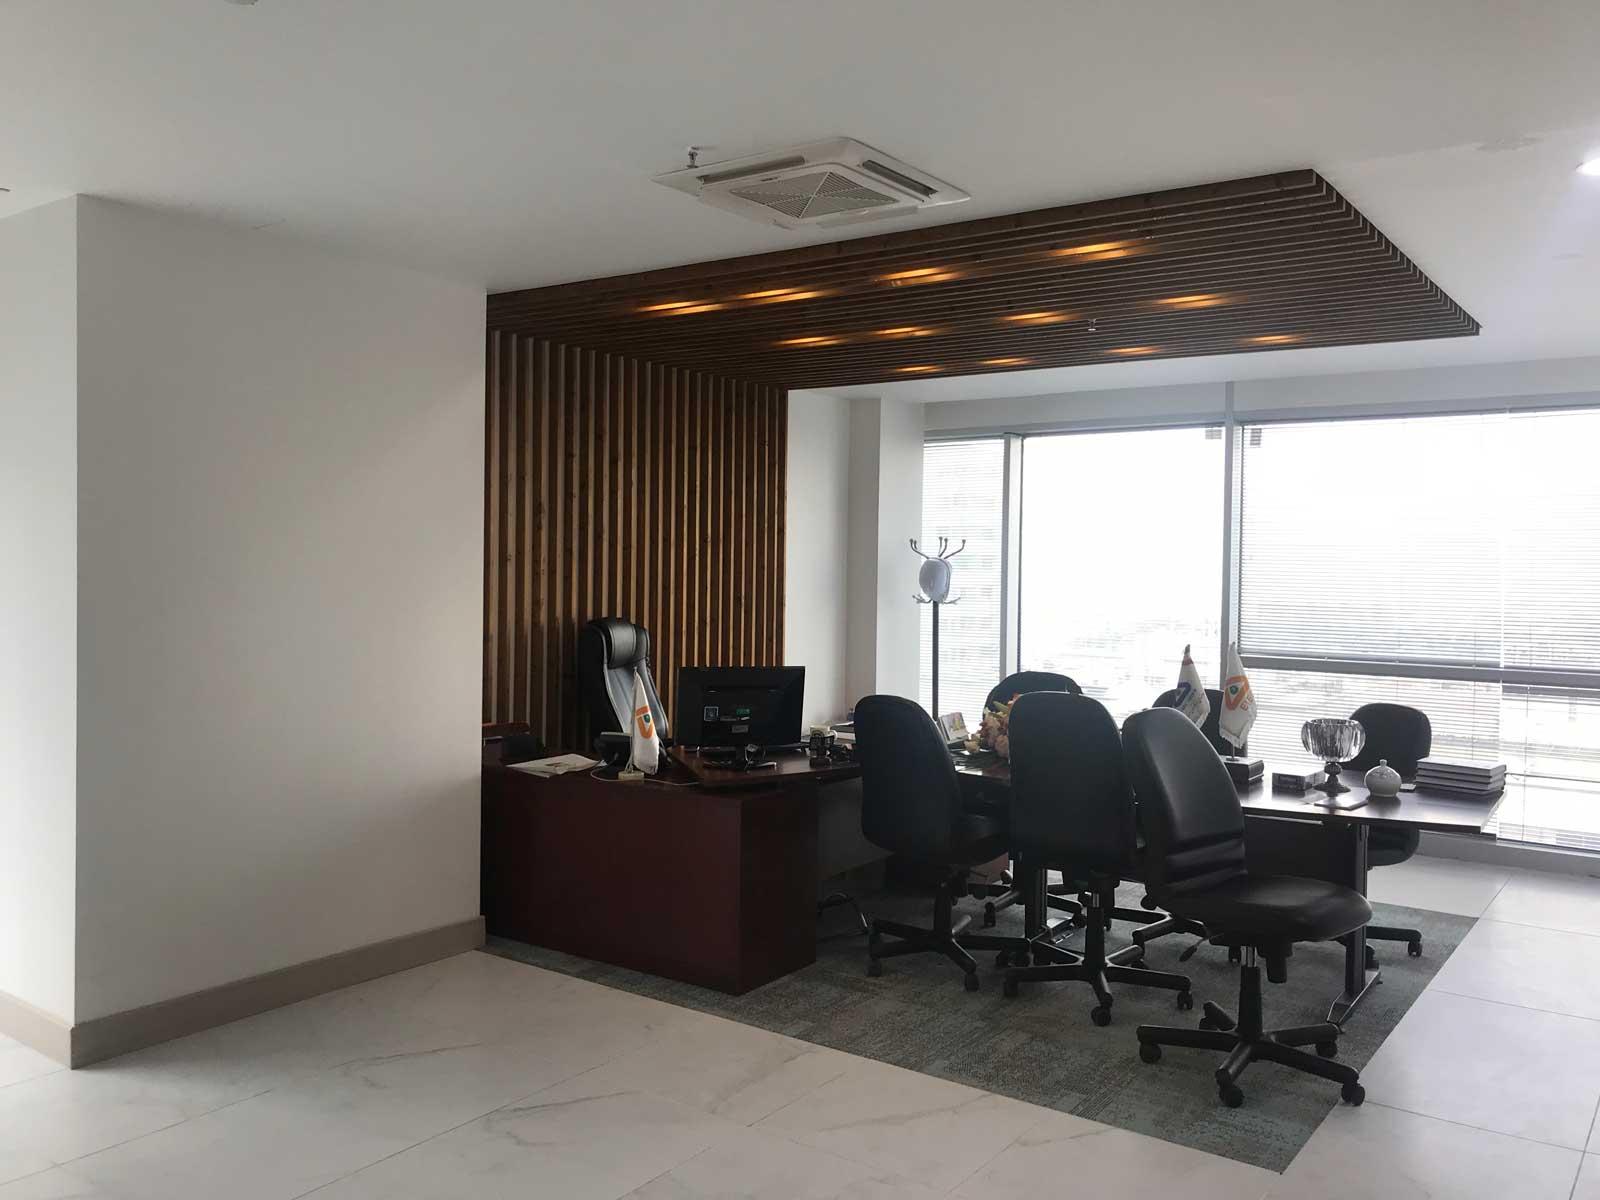 16-EIED Headquarter